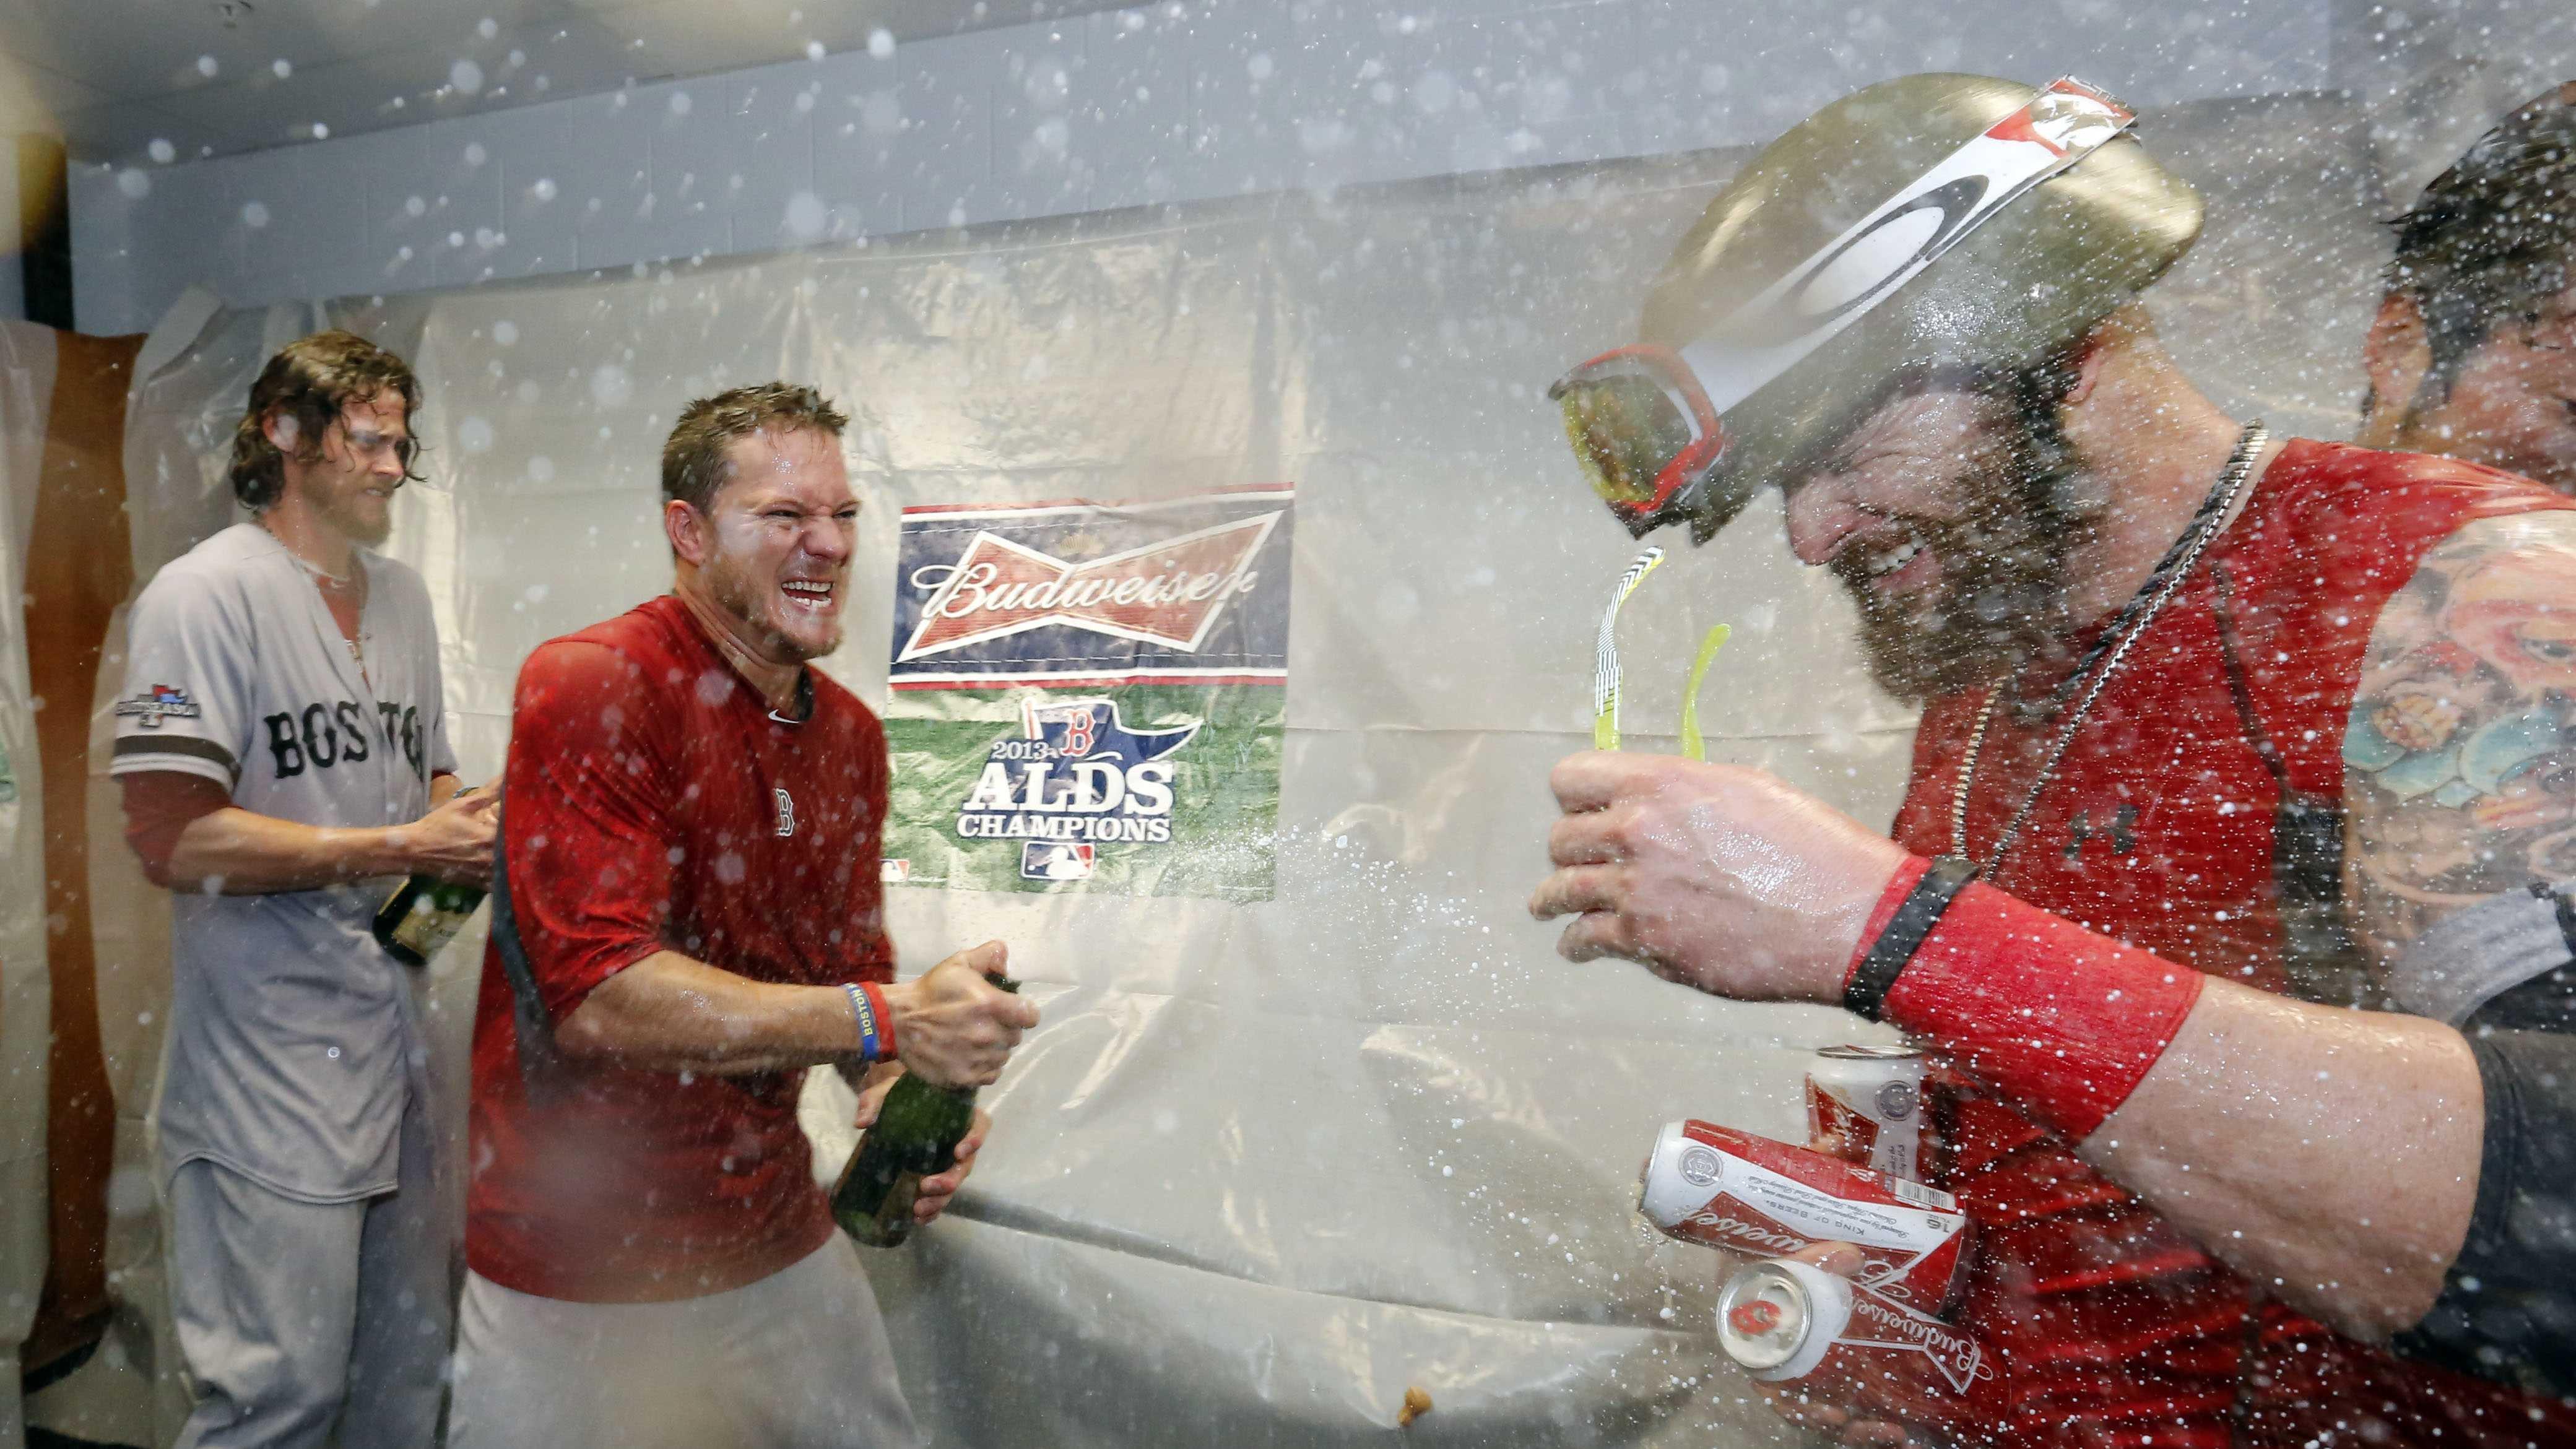 Champagne flows in locker room